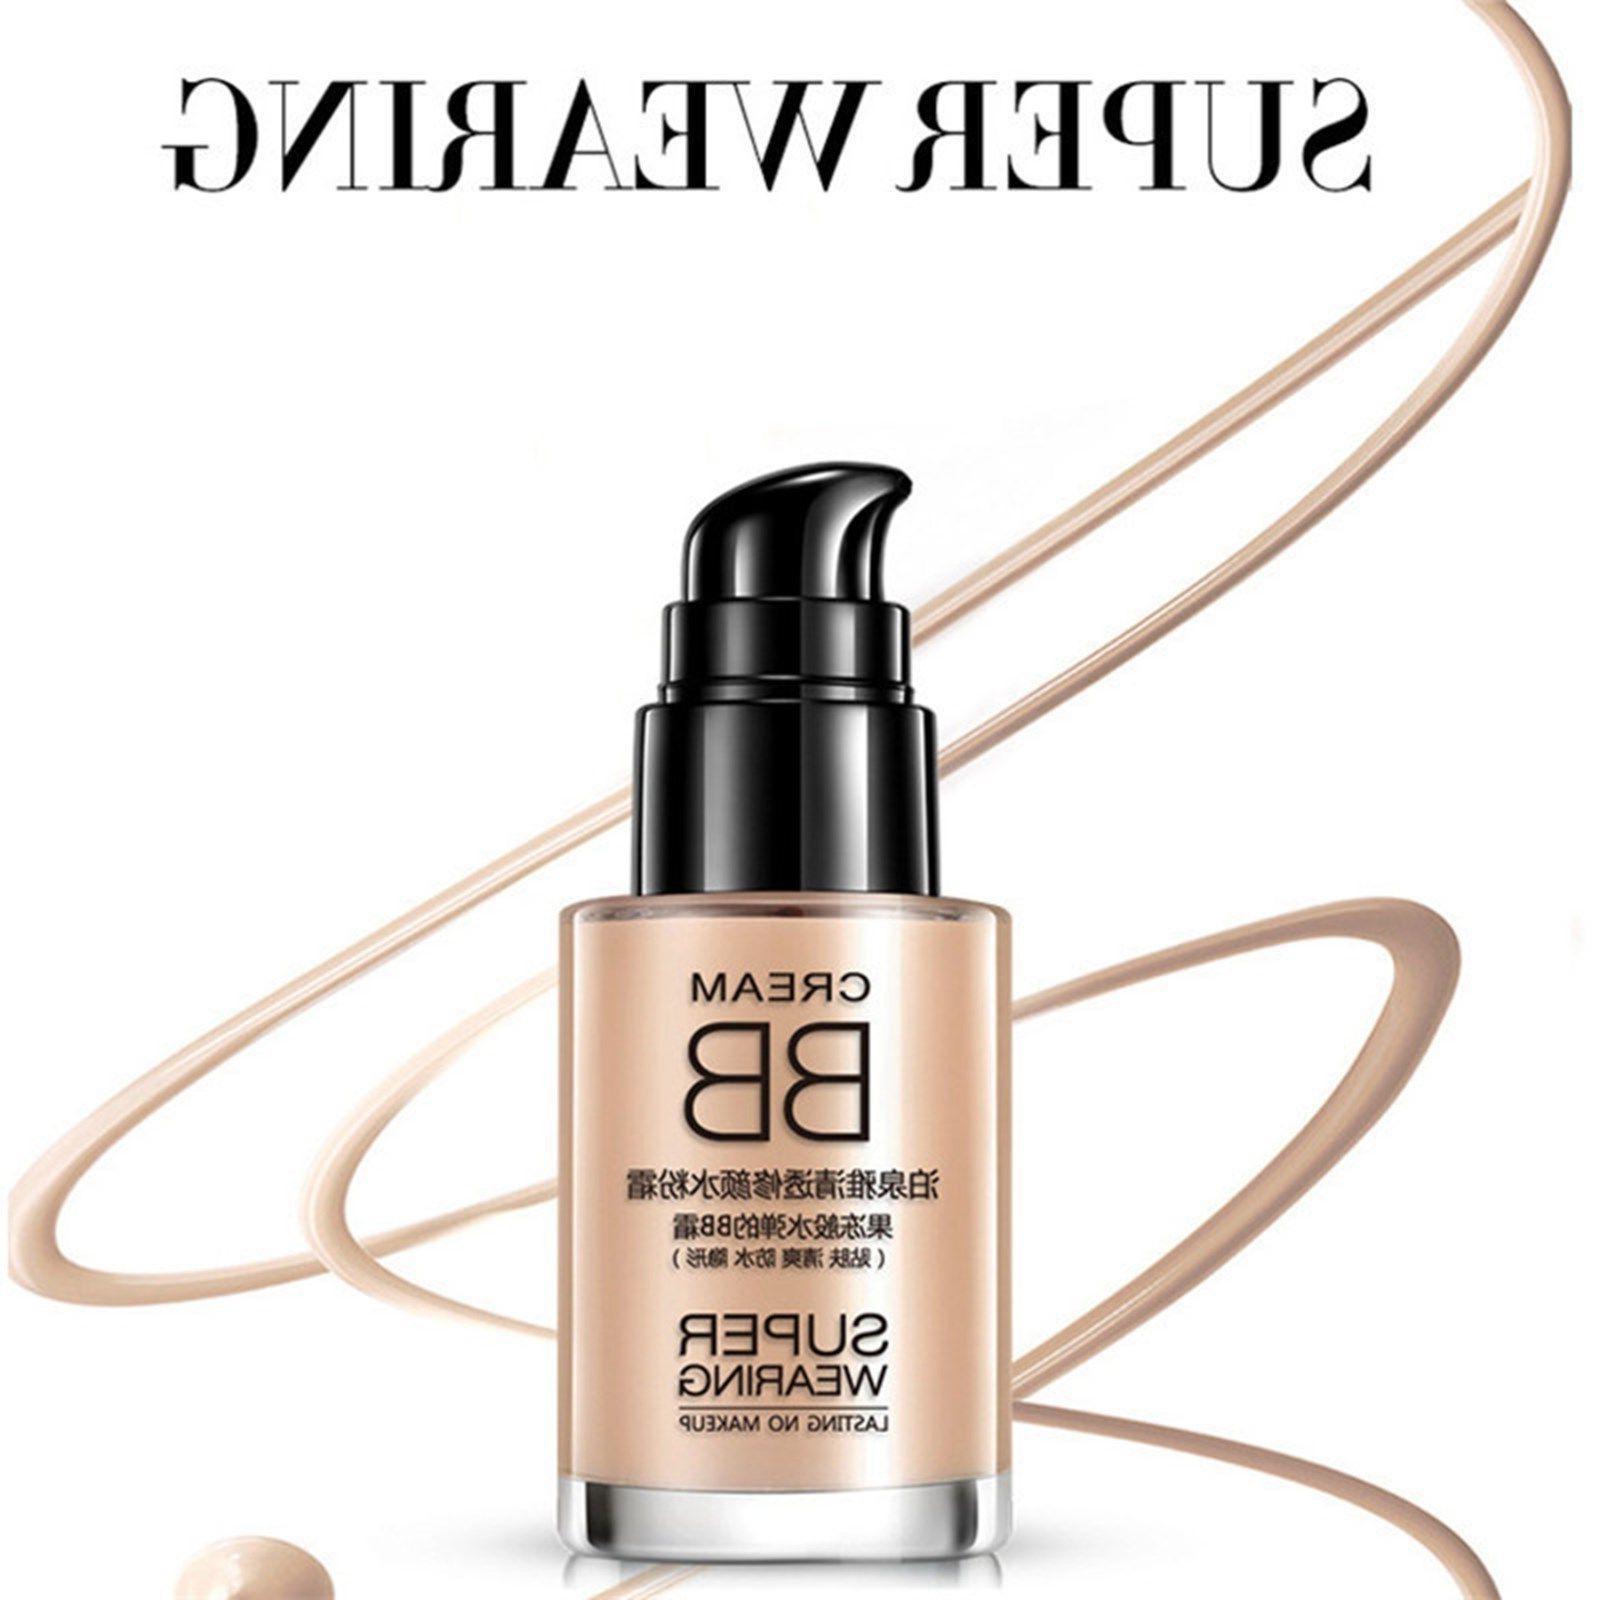 BIOAQU Whitening Foundation Makeup